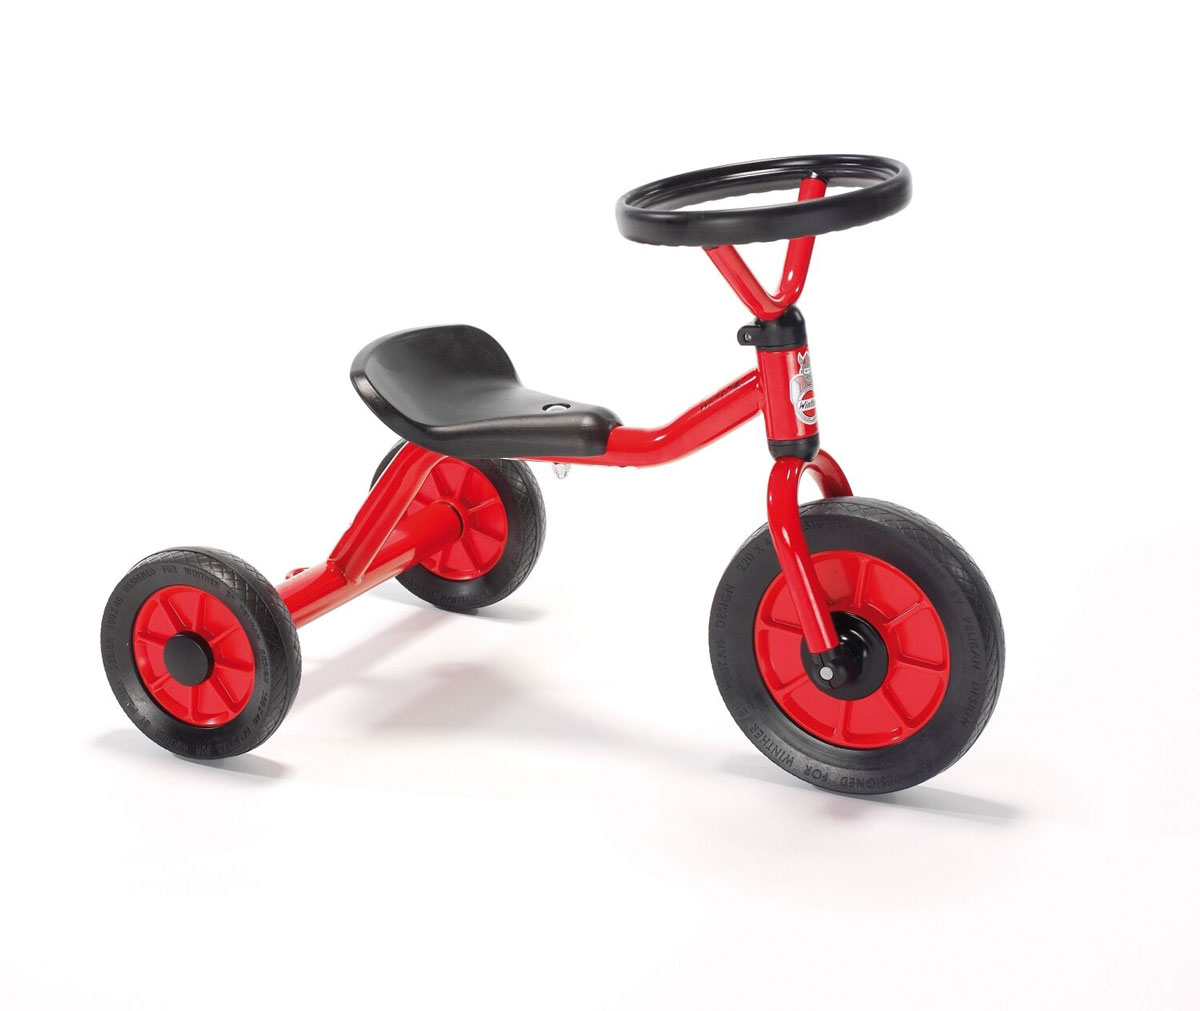 Winther Mini Rutschdreirad mit Lenkrad - Kinderfahrzeug 1-3 Jahre